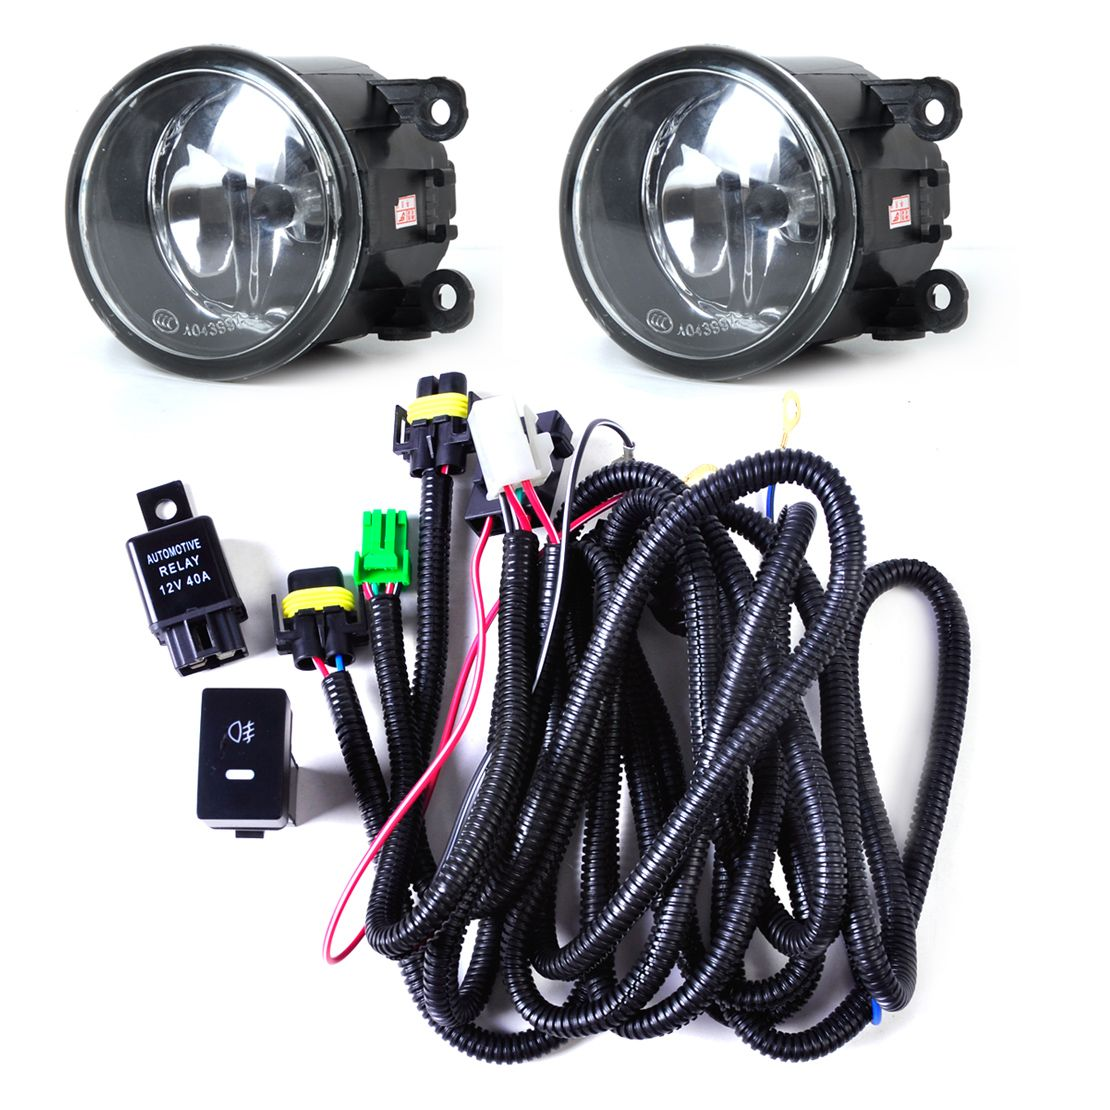 DWCX Black Wiring Harness Sockets + Switch + 2 Fog Lights H11 Lamp 12V 55W Kit for Ford Mustang Lincoln Navigator Subaru Outback